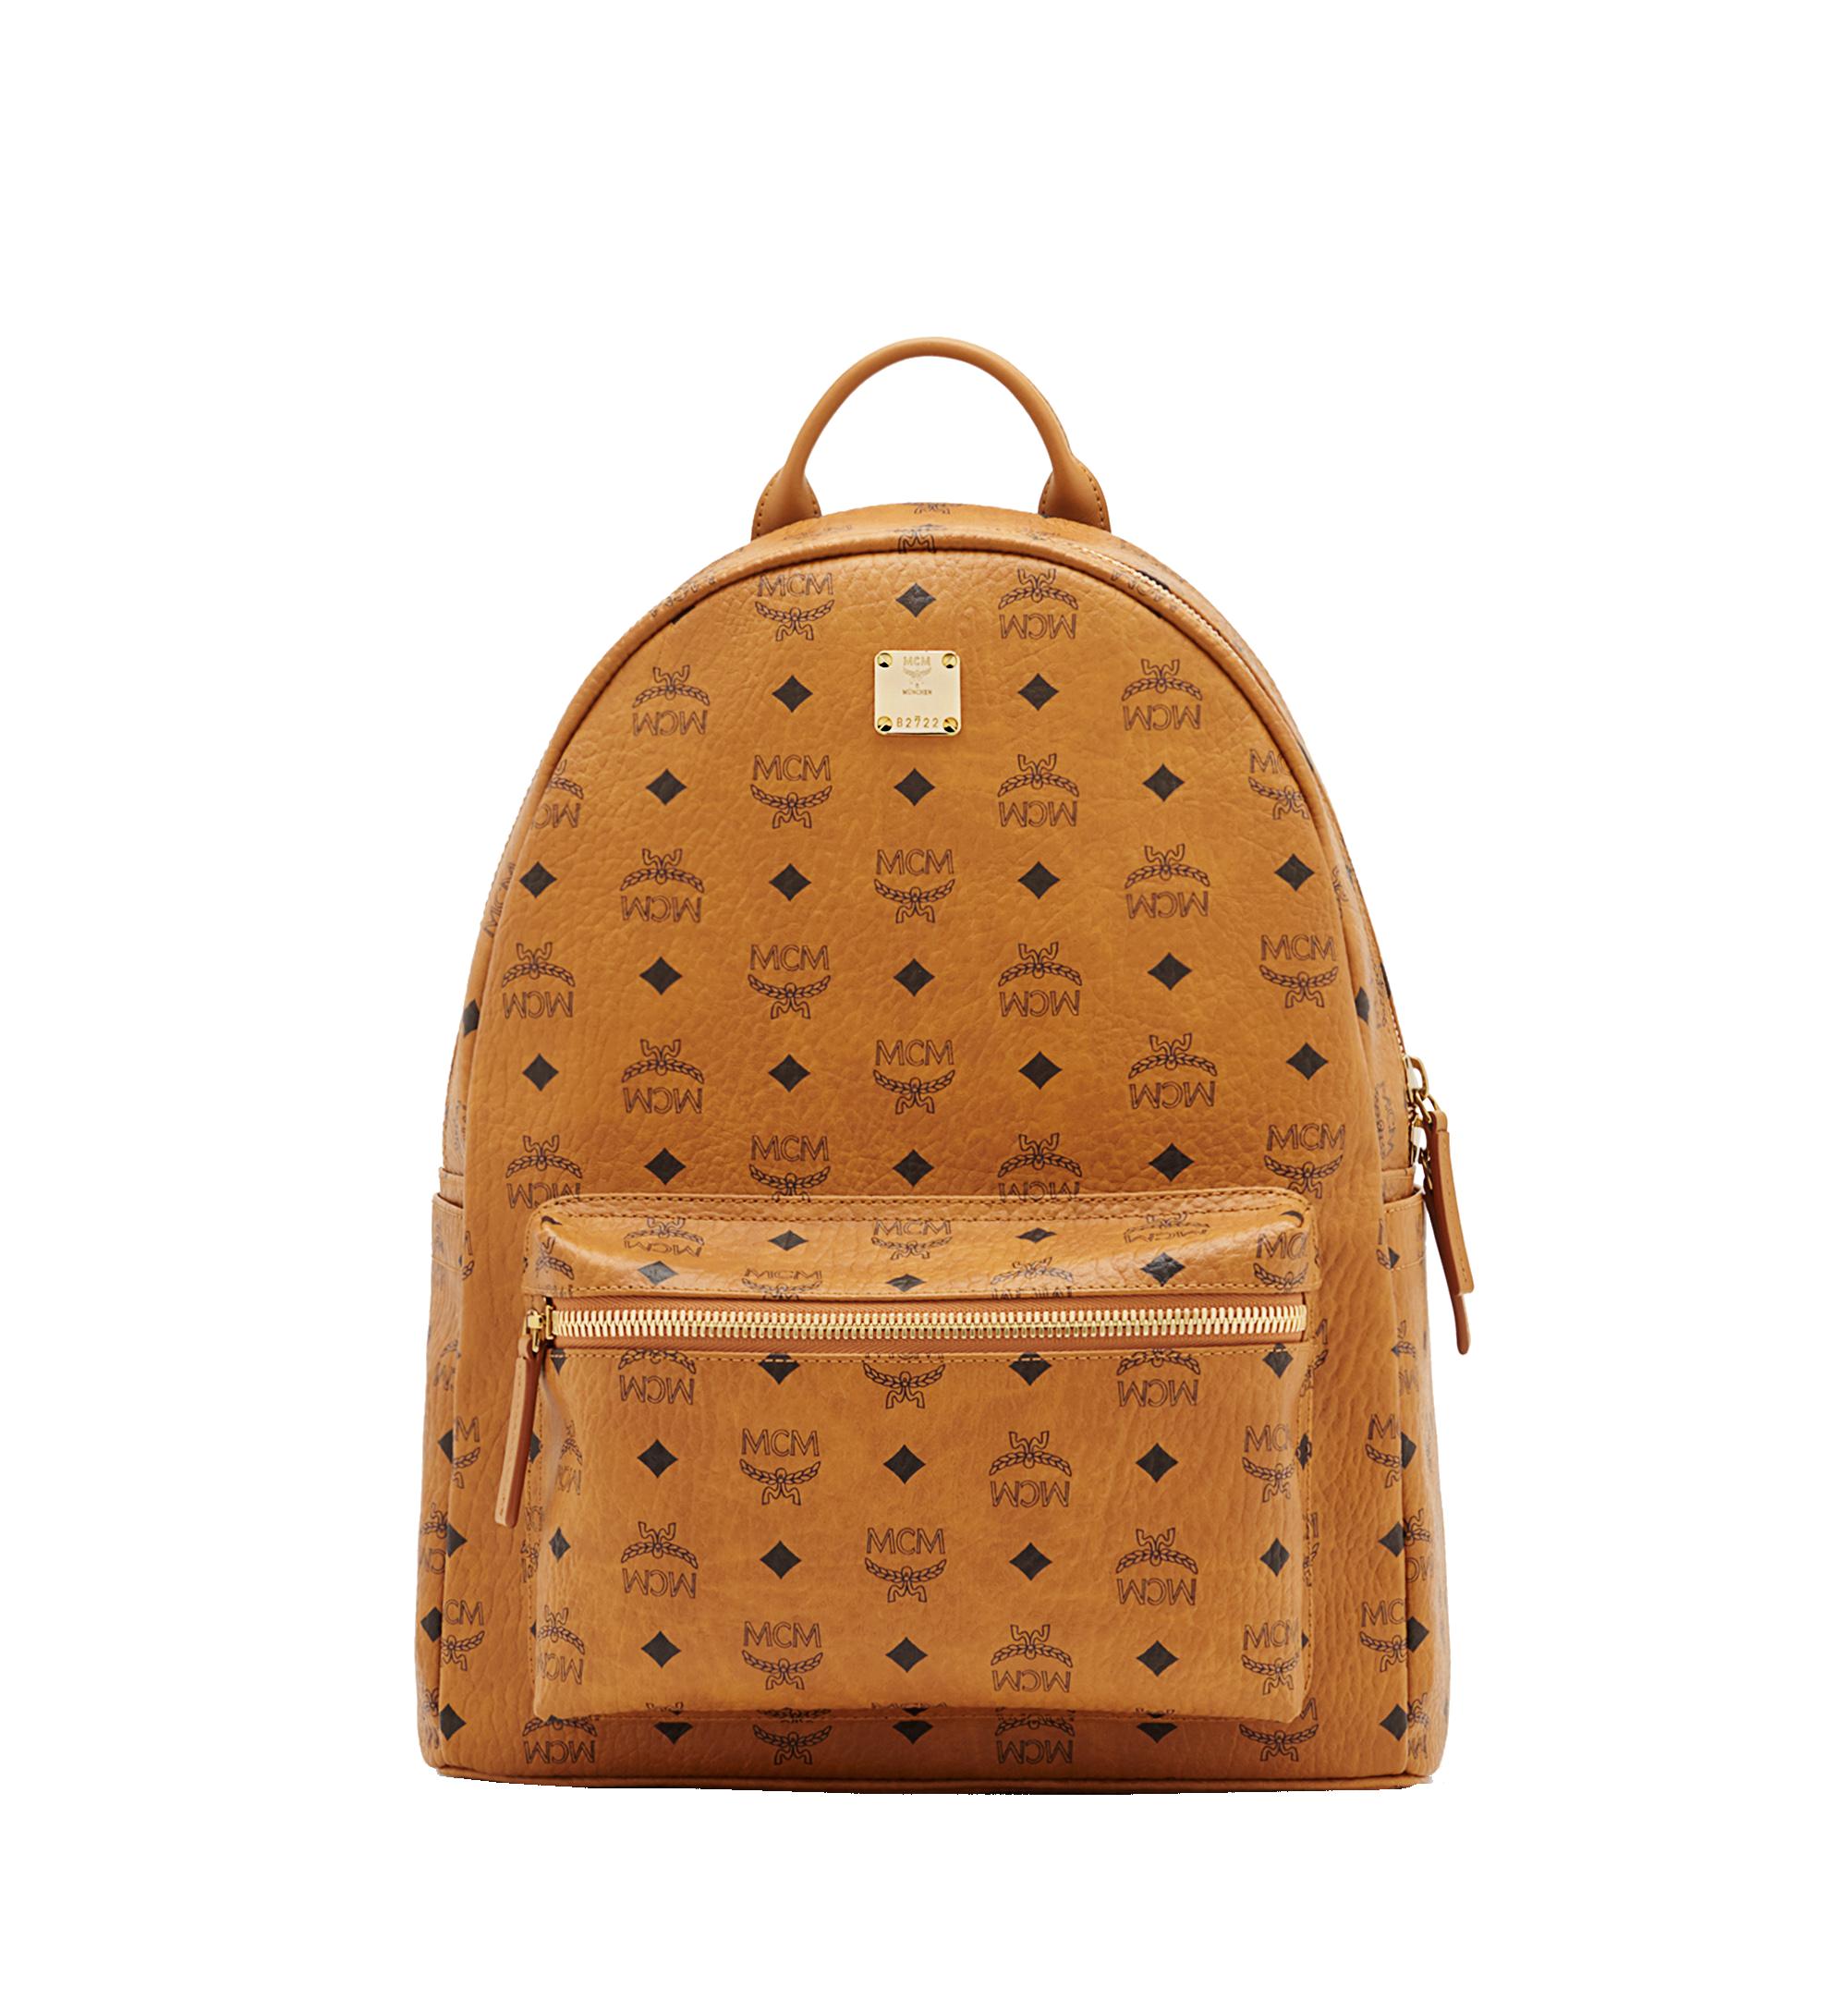 05be84790df4 40 cm / 16 in Stark Classic Backpack in Visetos Cognac   MCM